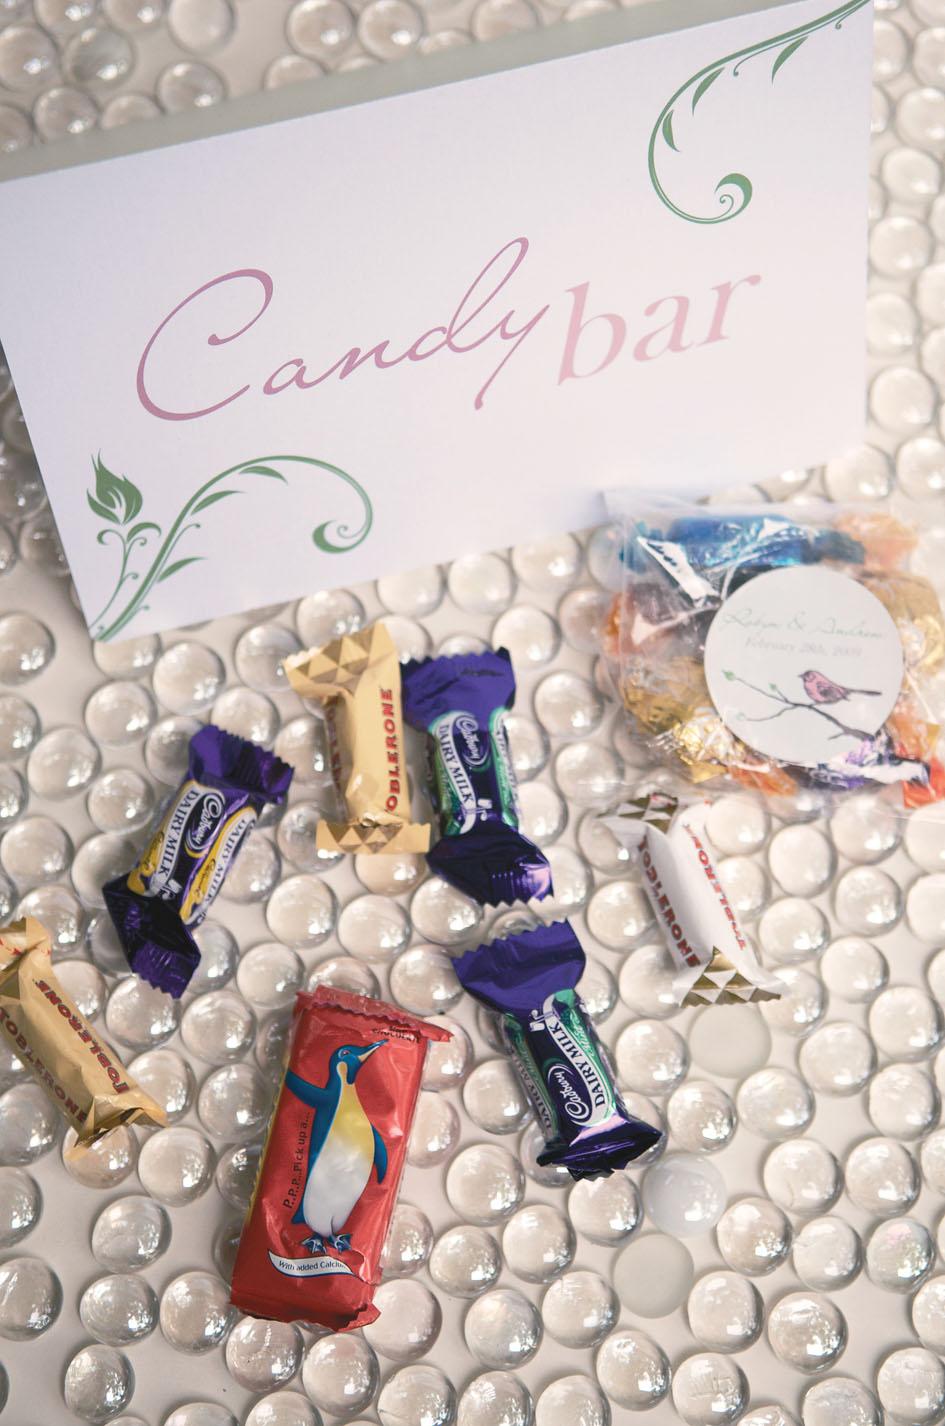 Thomas Dixon Favors-Candy Bar.jpg